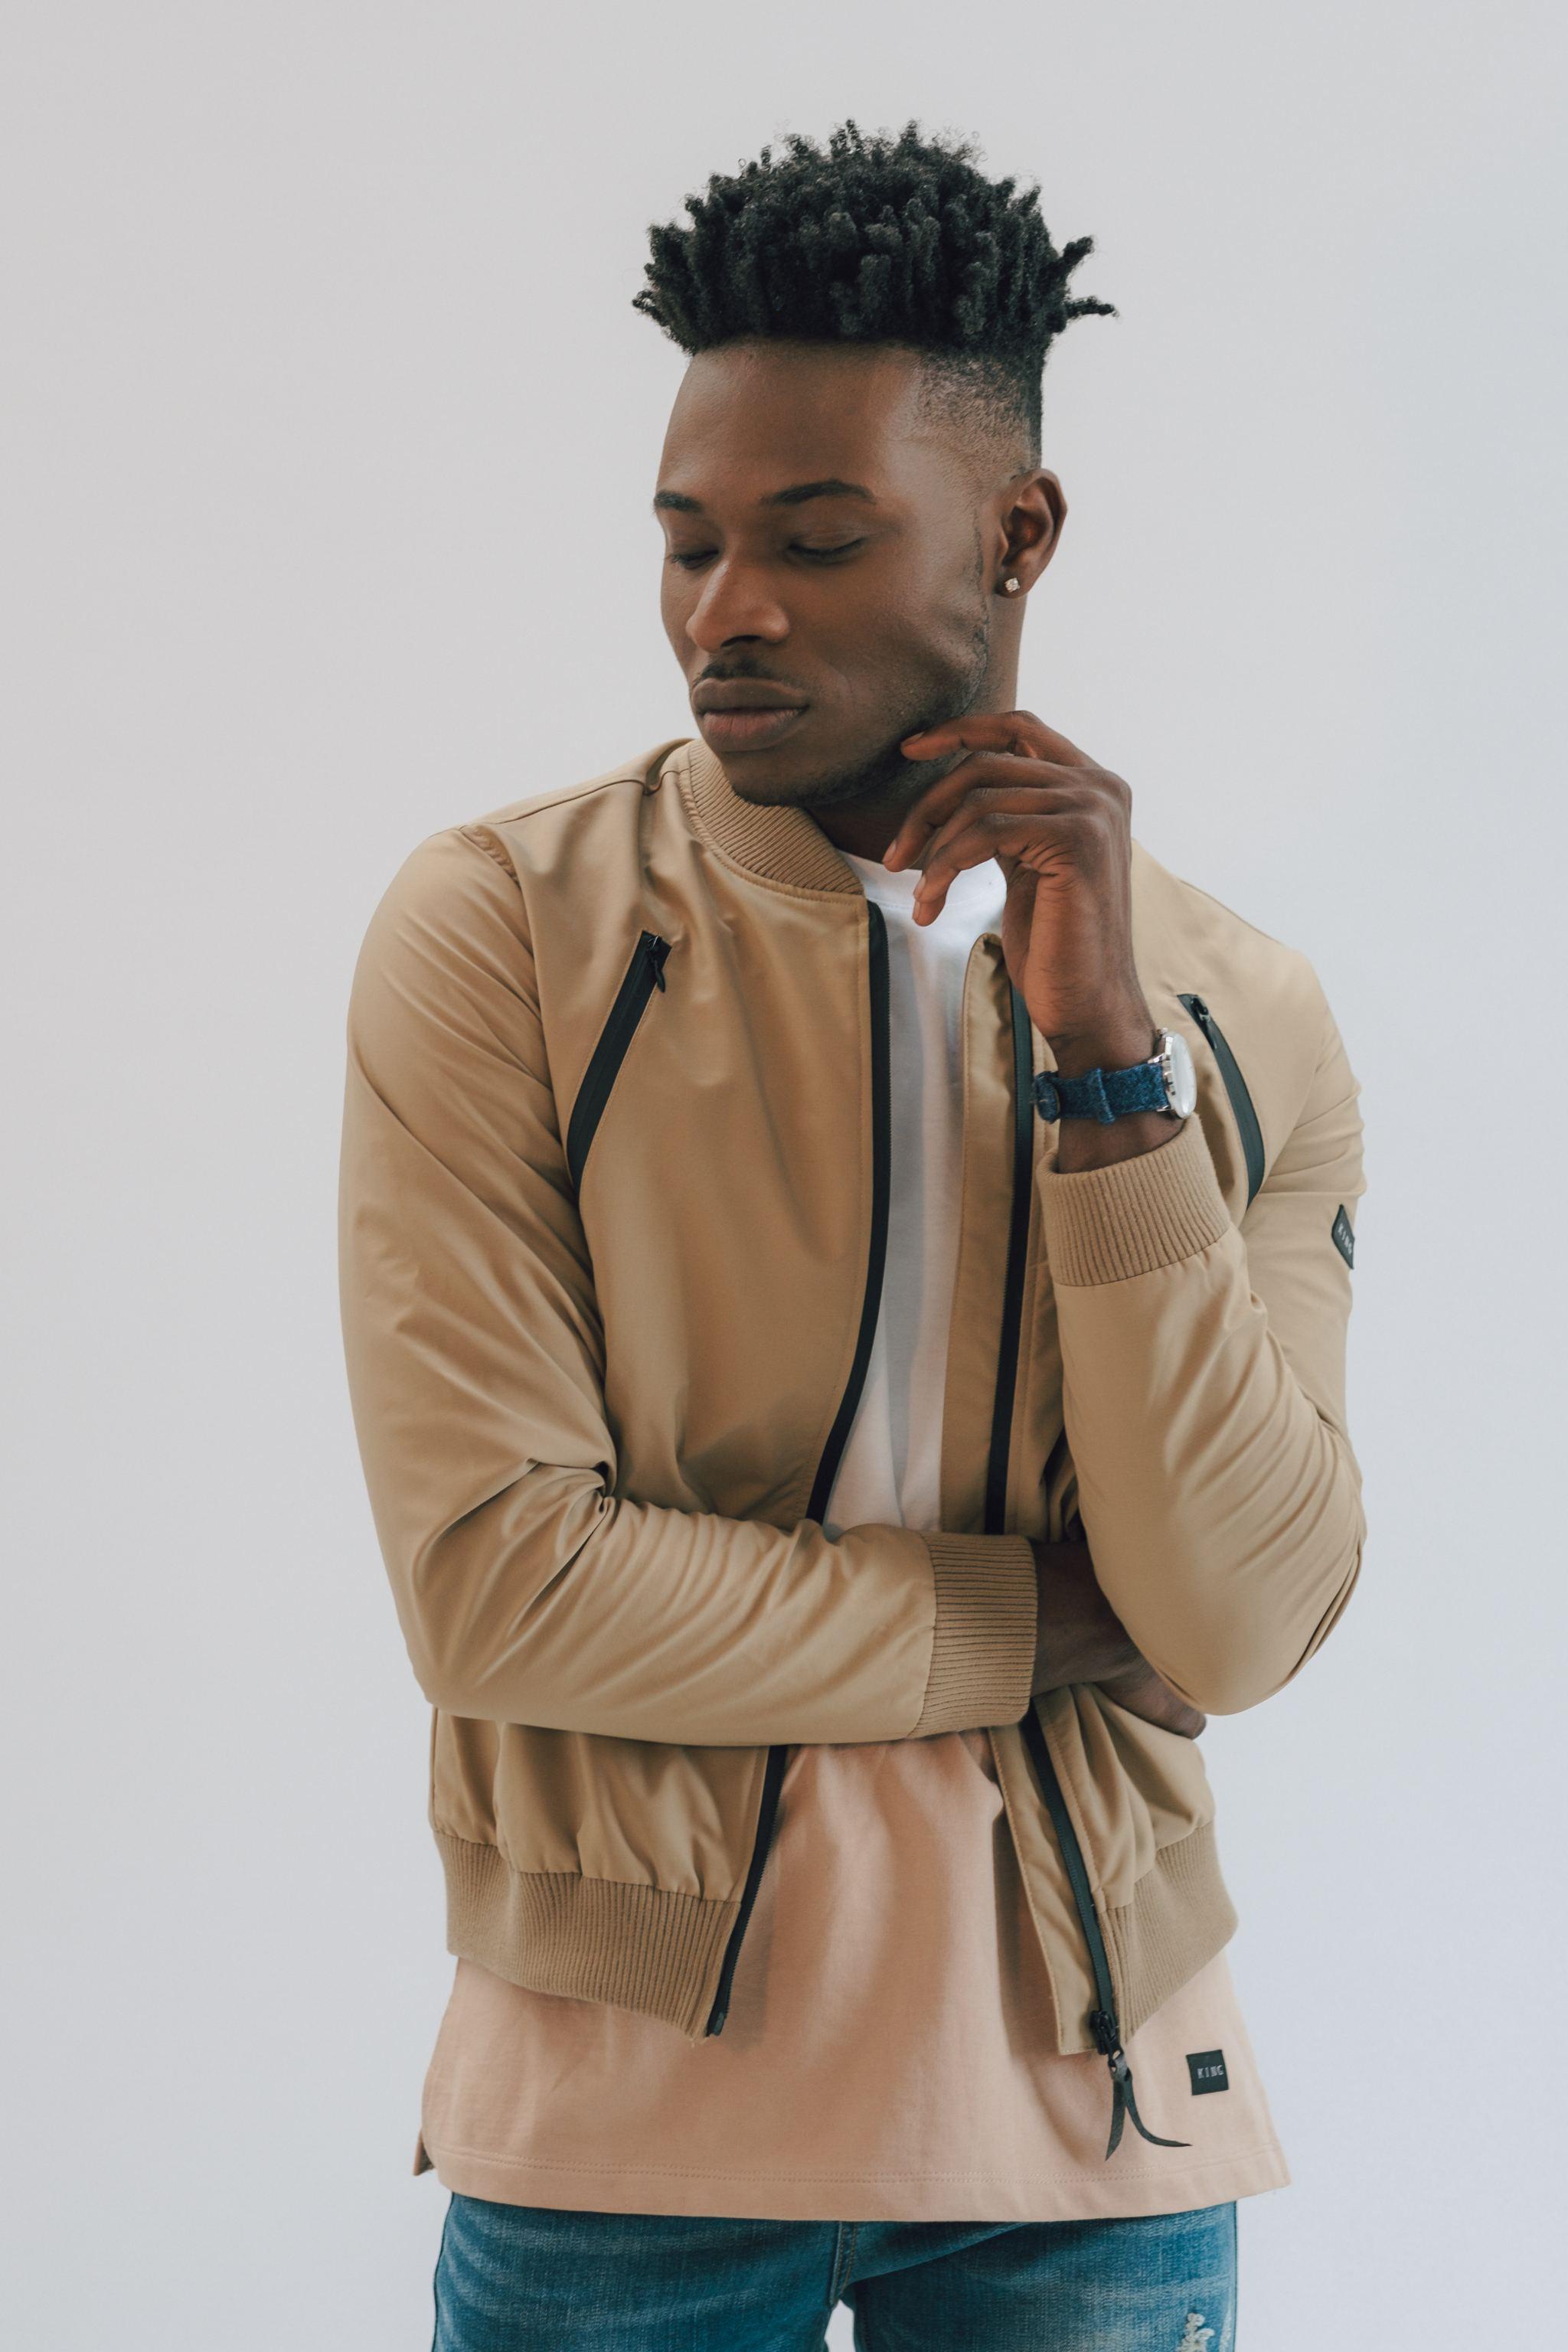 Streetwear king apparel